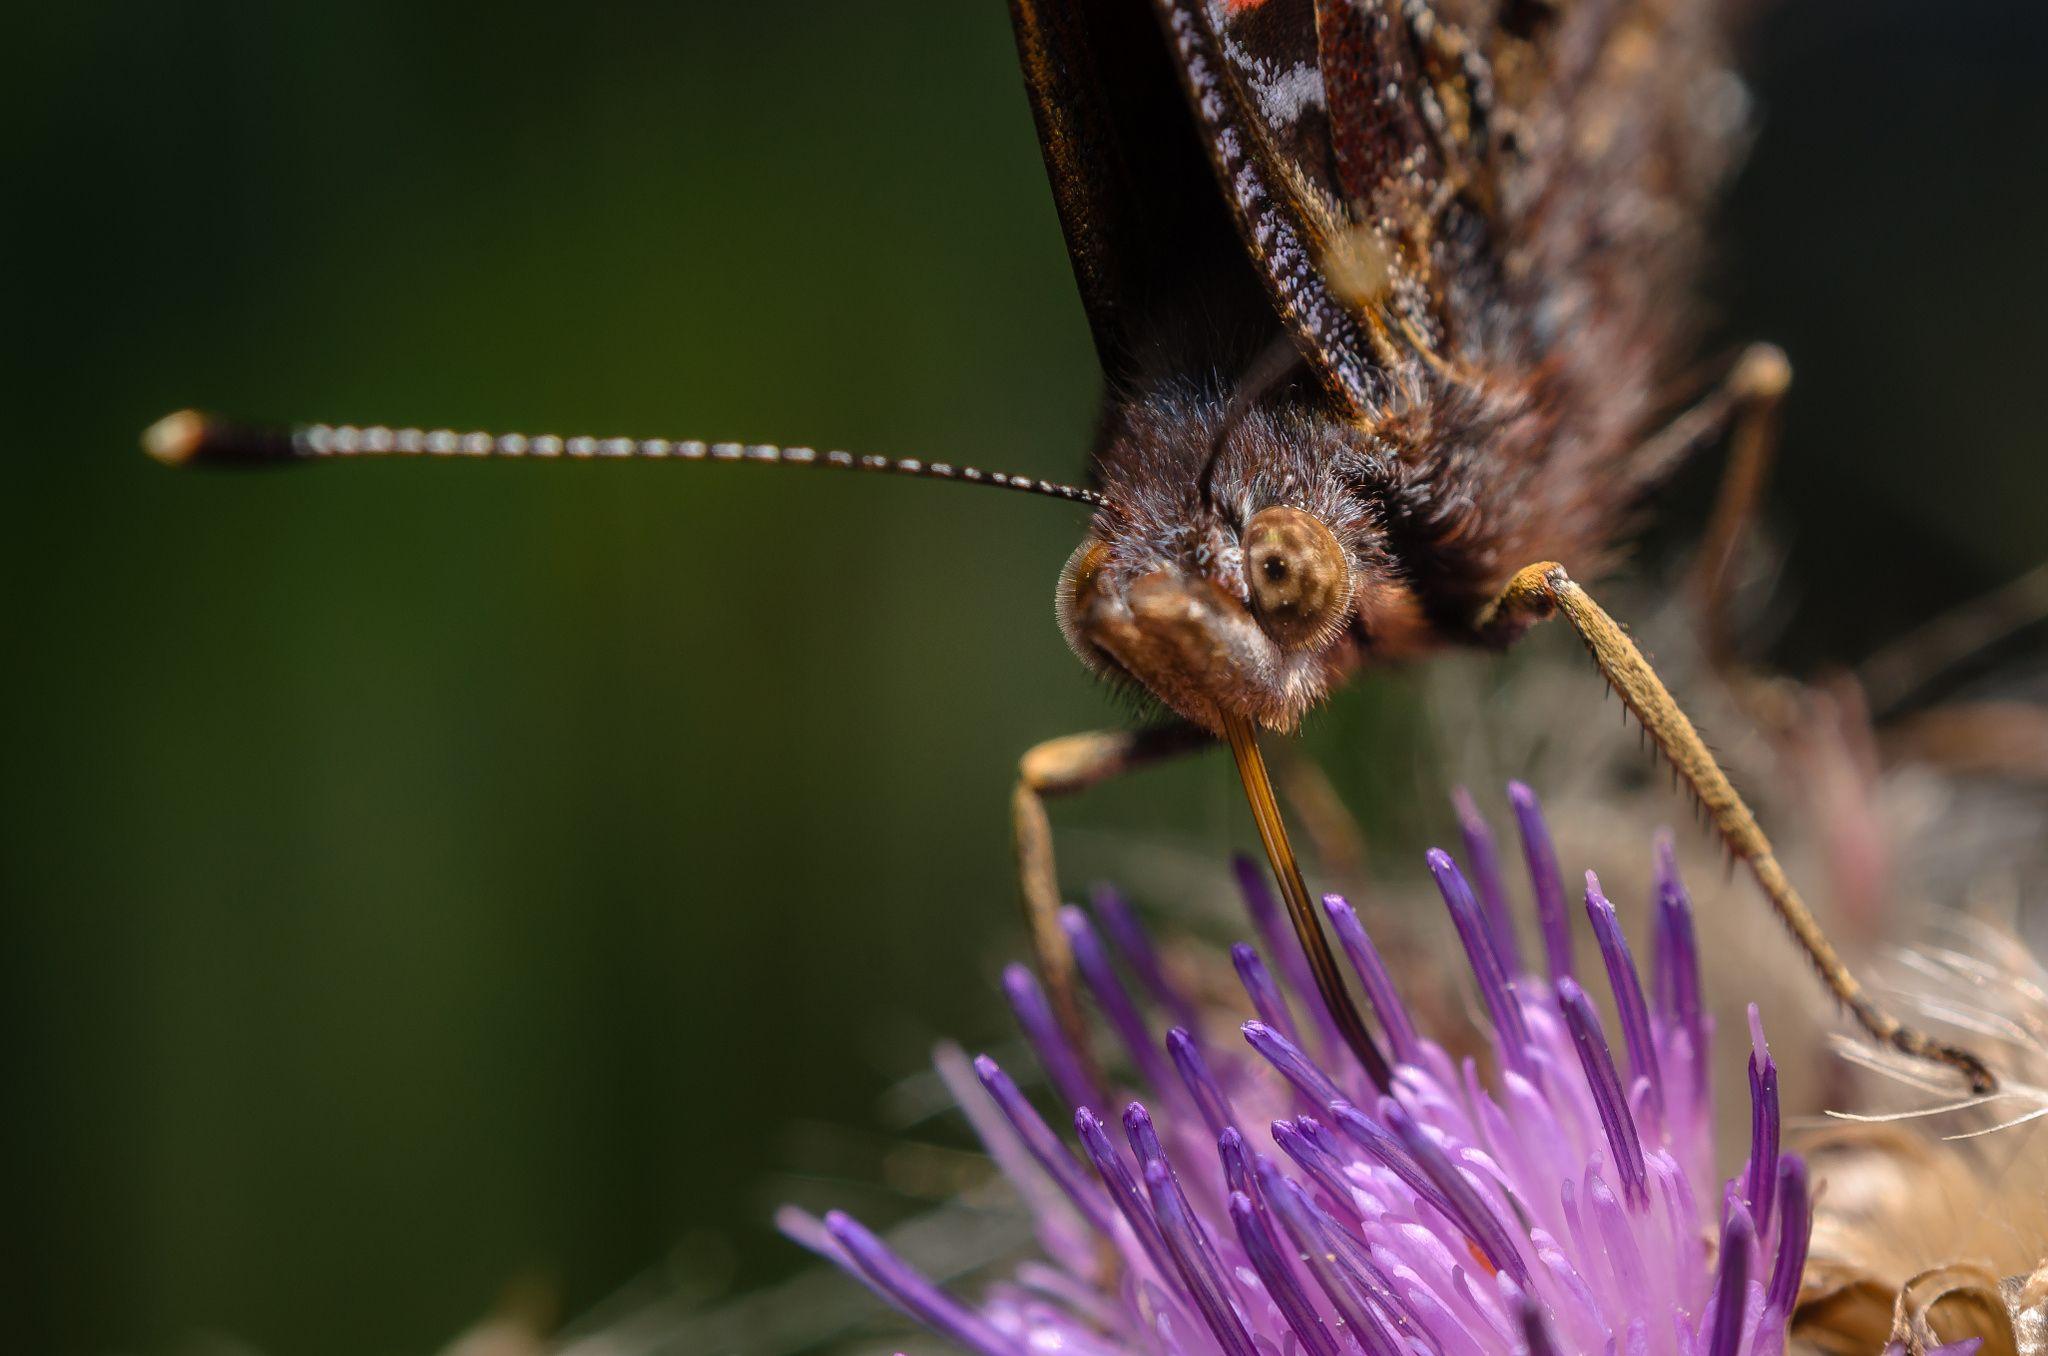 Butterfly on the thistle by Marek Weisskopf on 500px